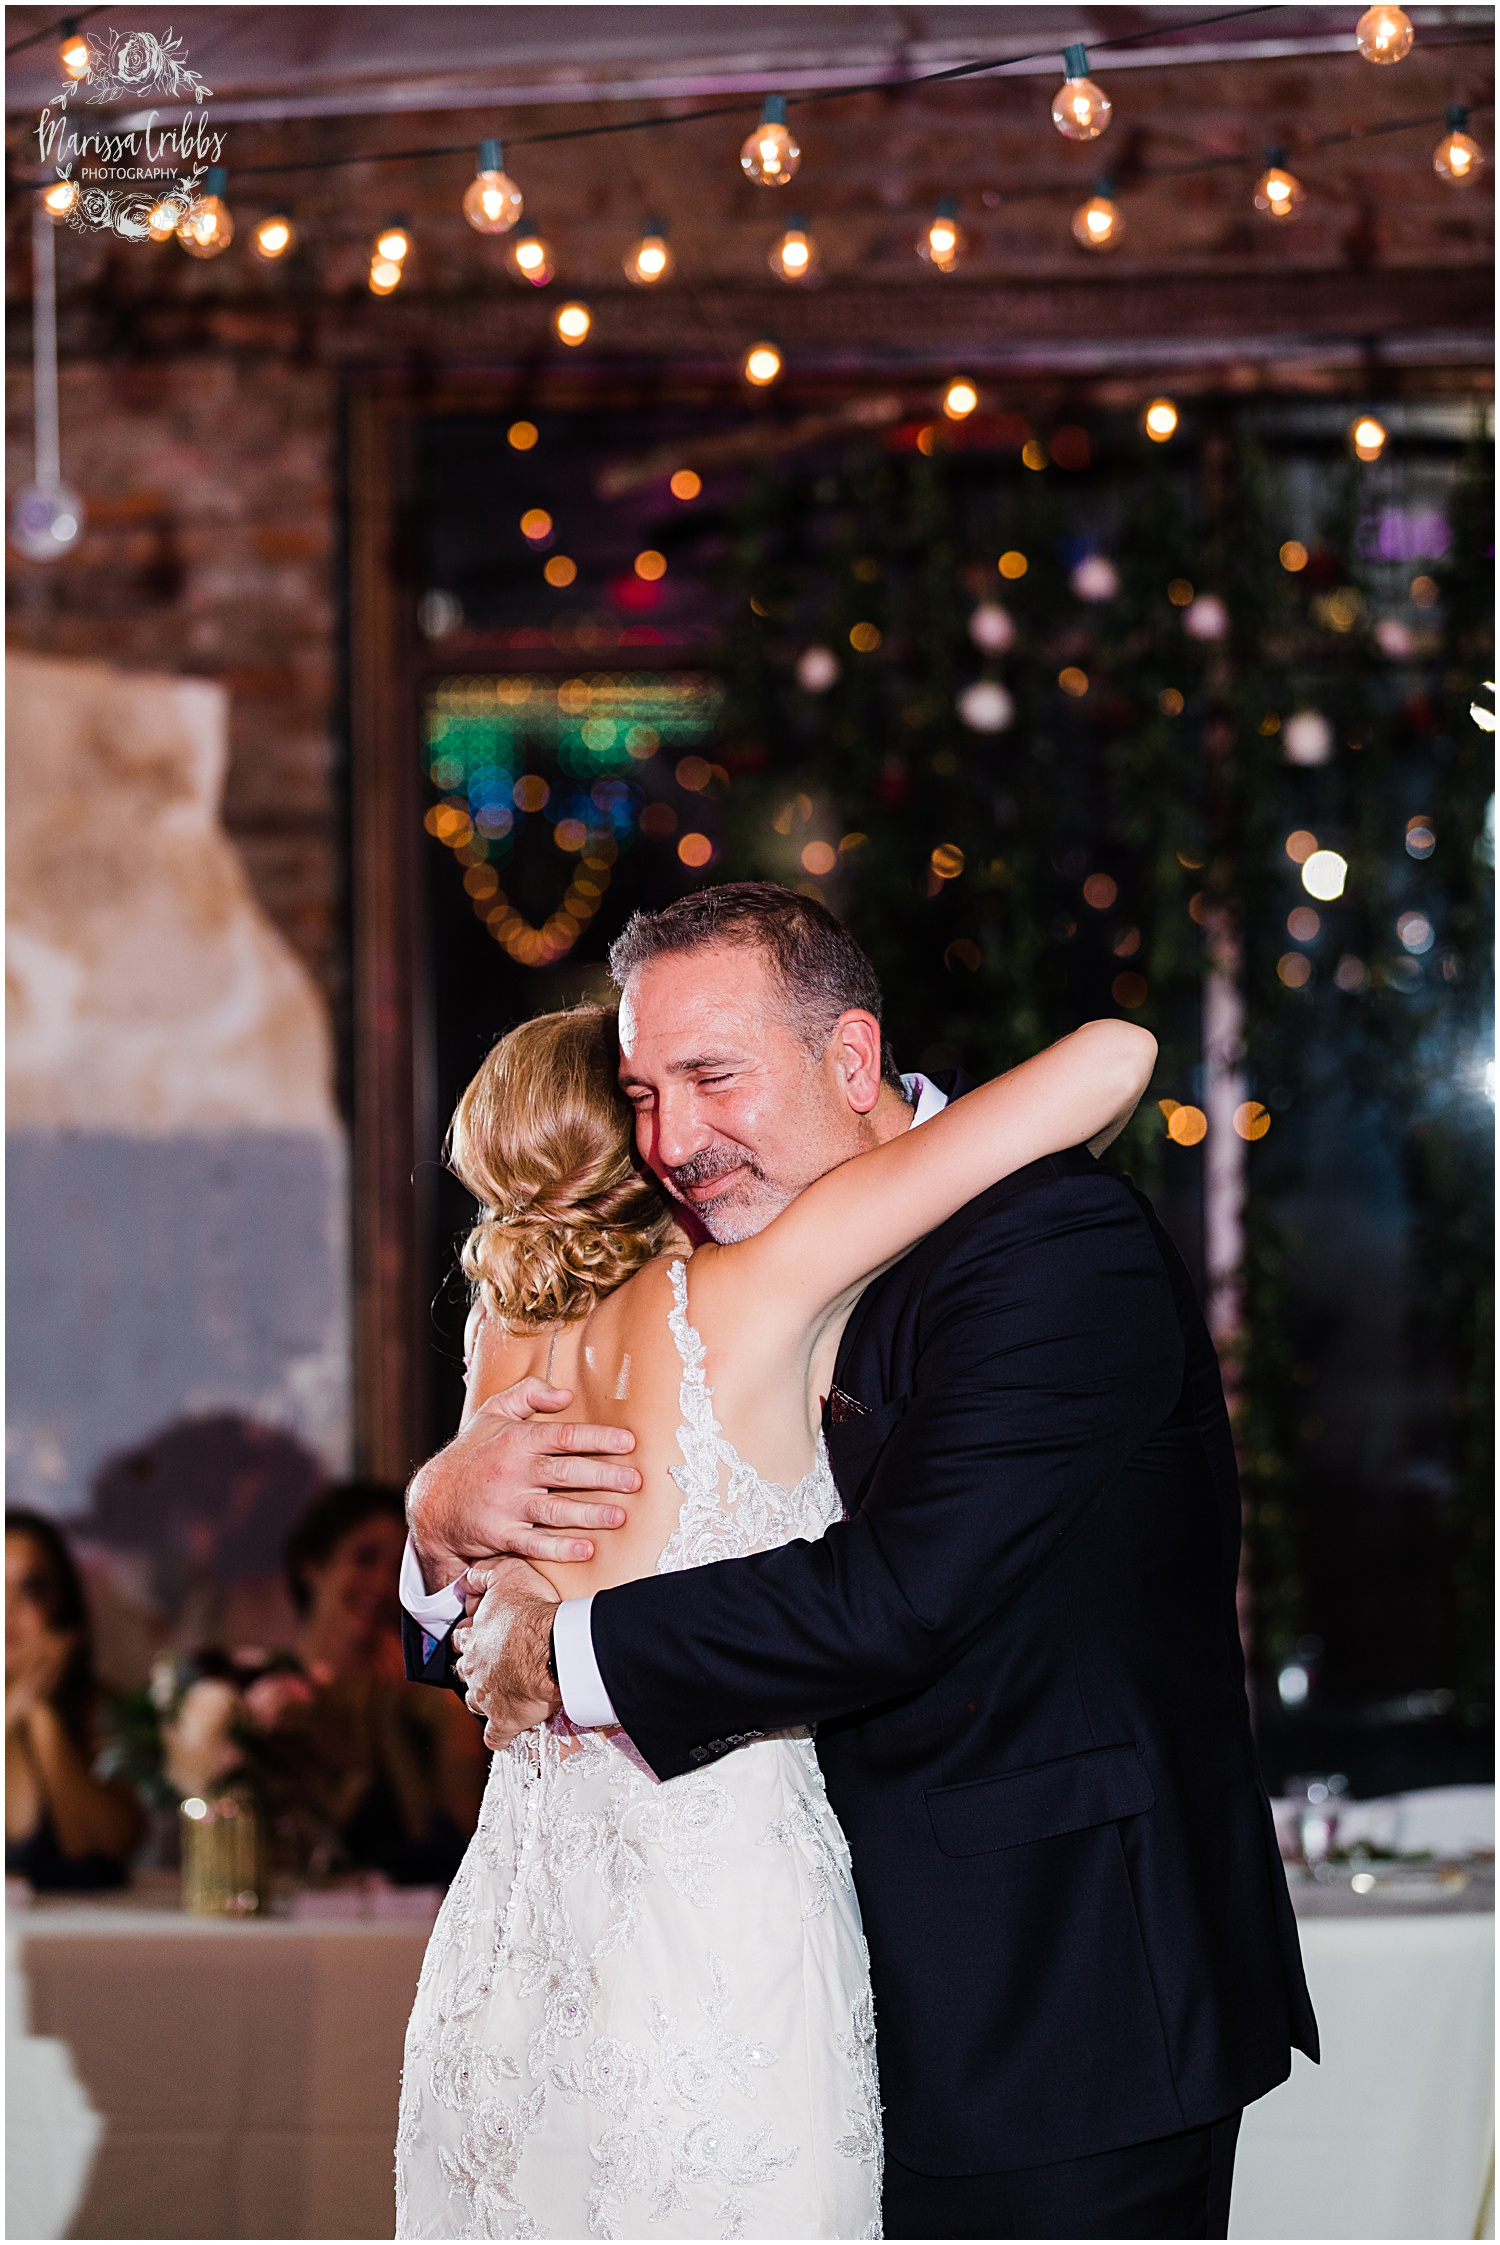 BAUER WEDDING   KELSEA & JUSTIN   MARISSA CRIBBS PHOTOGRAPHY_6601.jpg